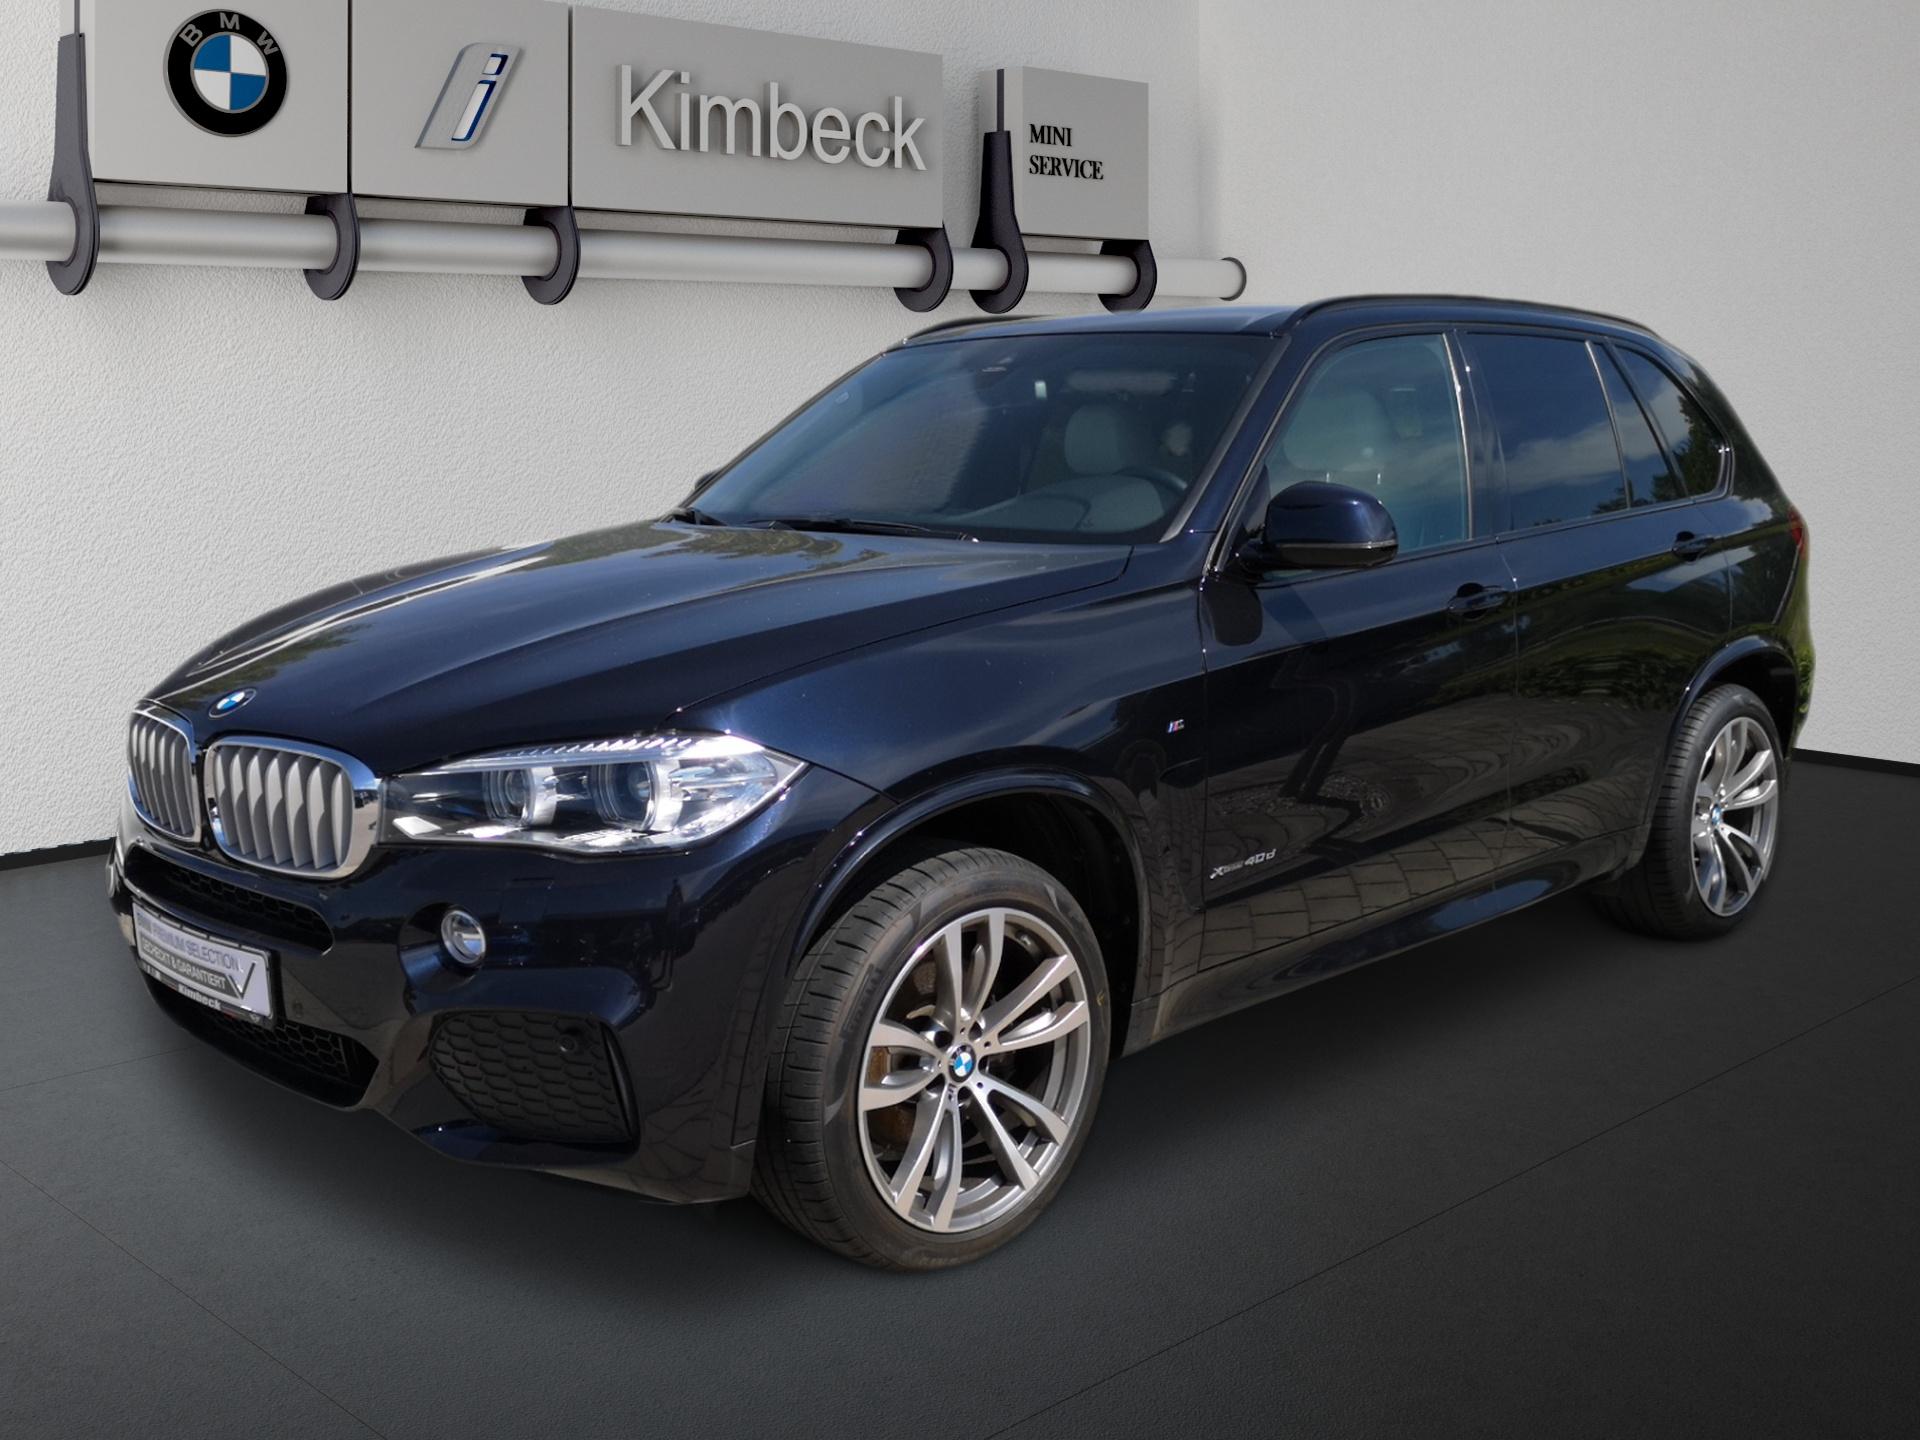 BMW X5 xDrive40d M SPORT Xenon AHK DrivingAss. 360°, Jahr 2018, Diesel